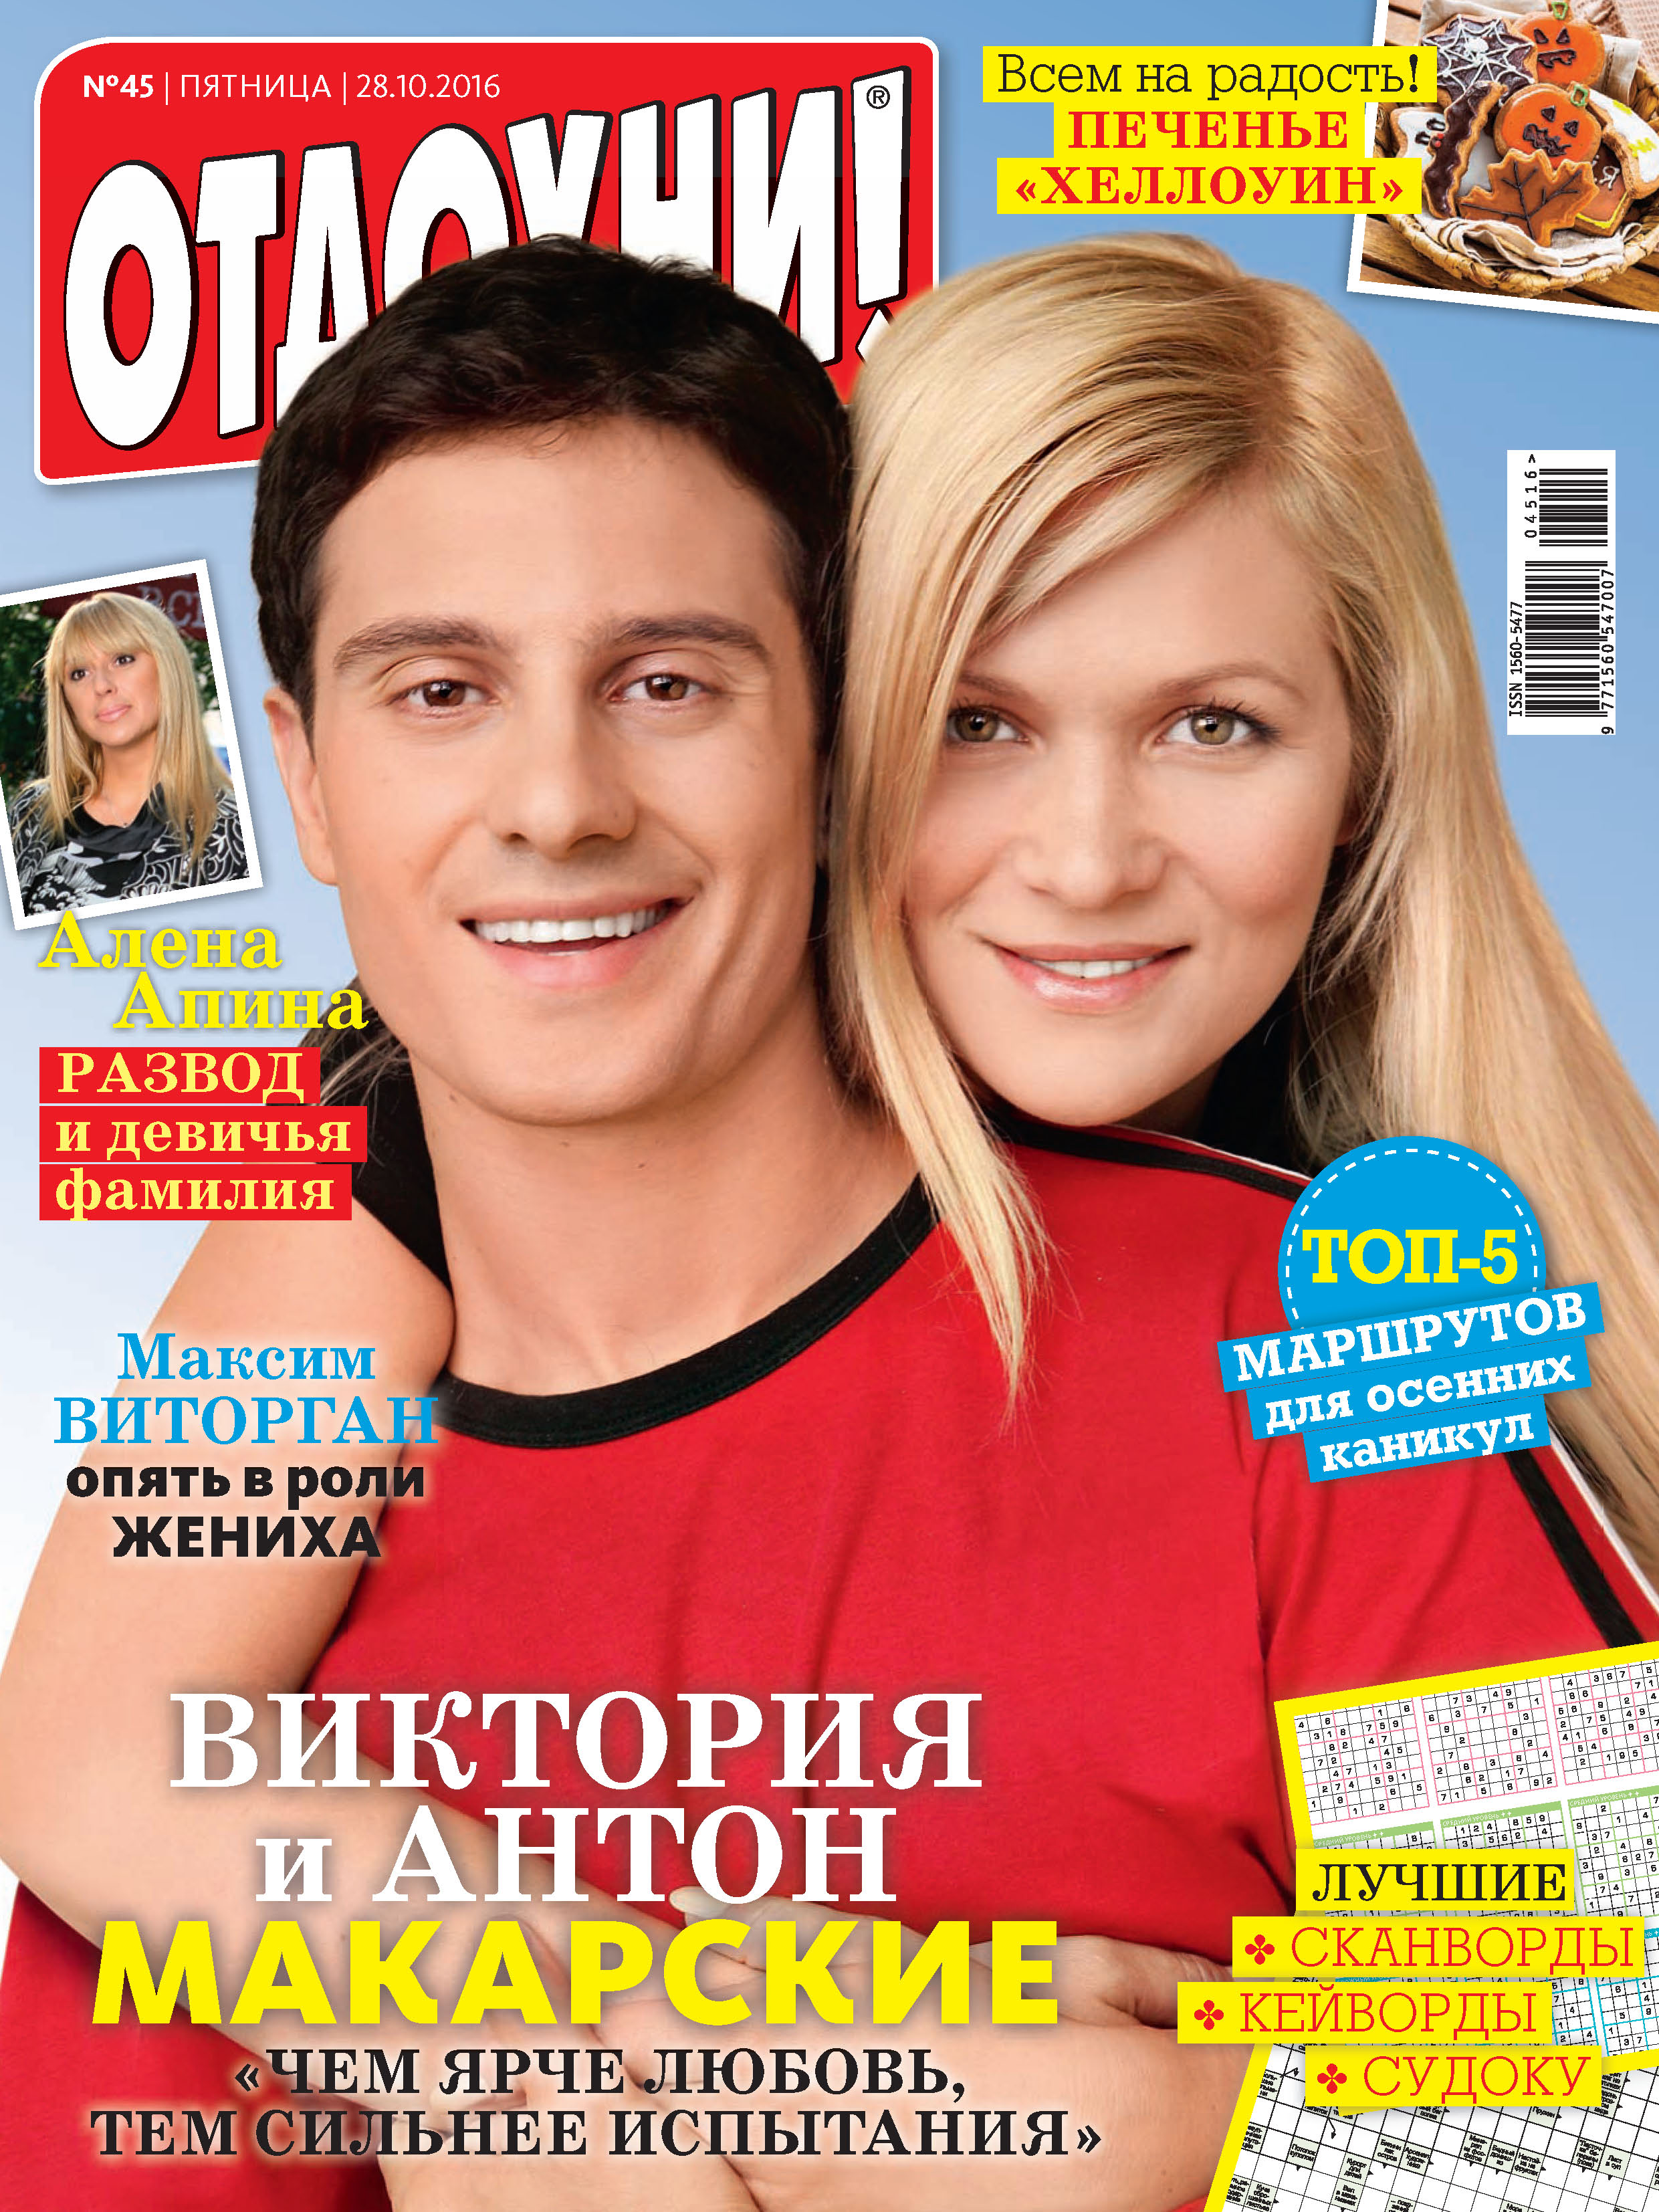 ИД «Бурда» Журнал «Отдохни!» №45/2016 ид бурда журнал отдохни 07 2016